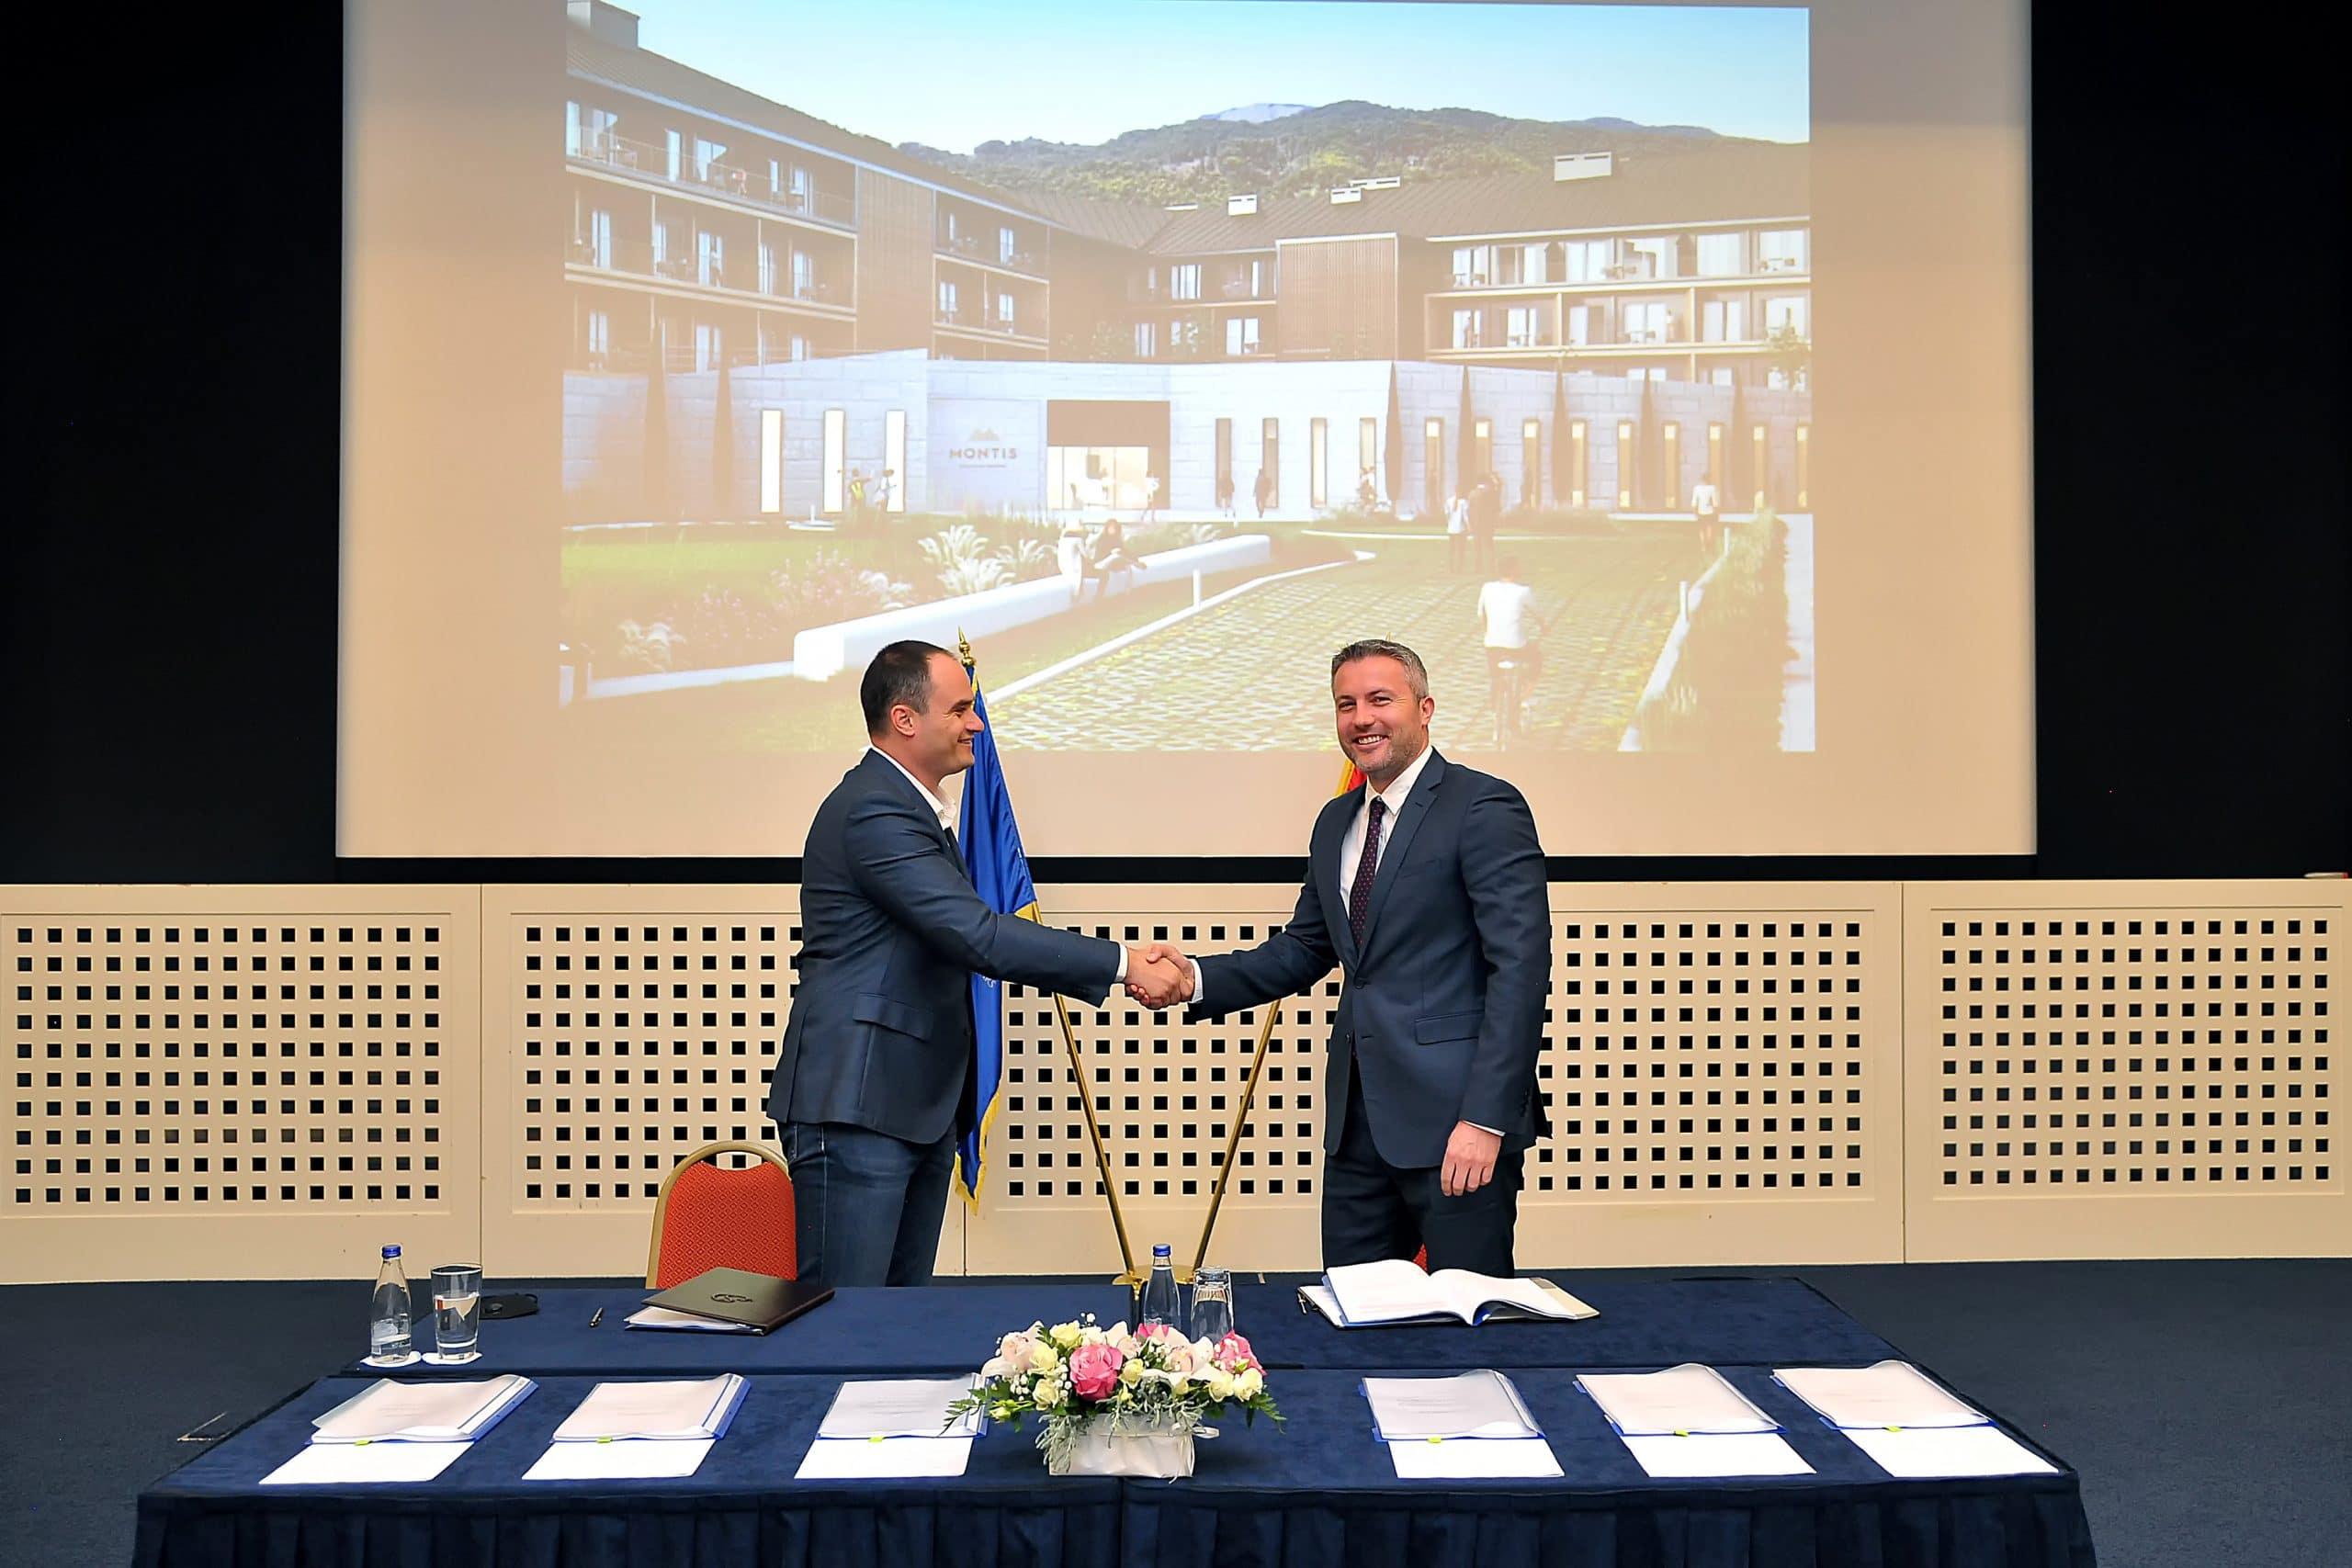 Goldan group and Splendid partnership